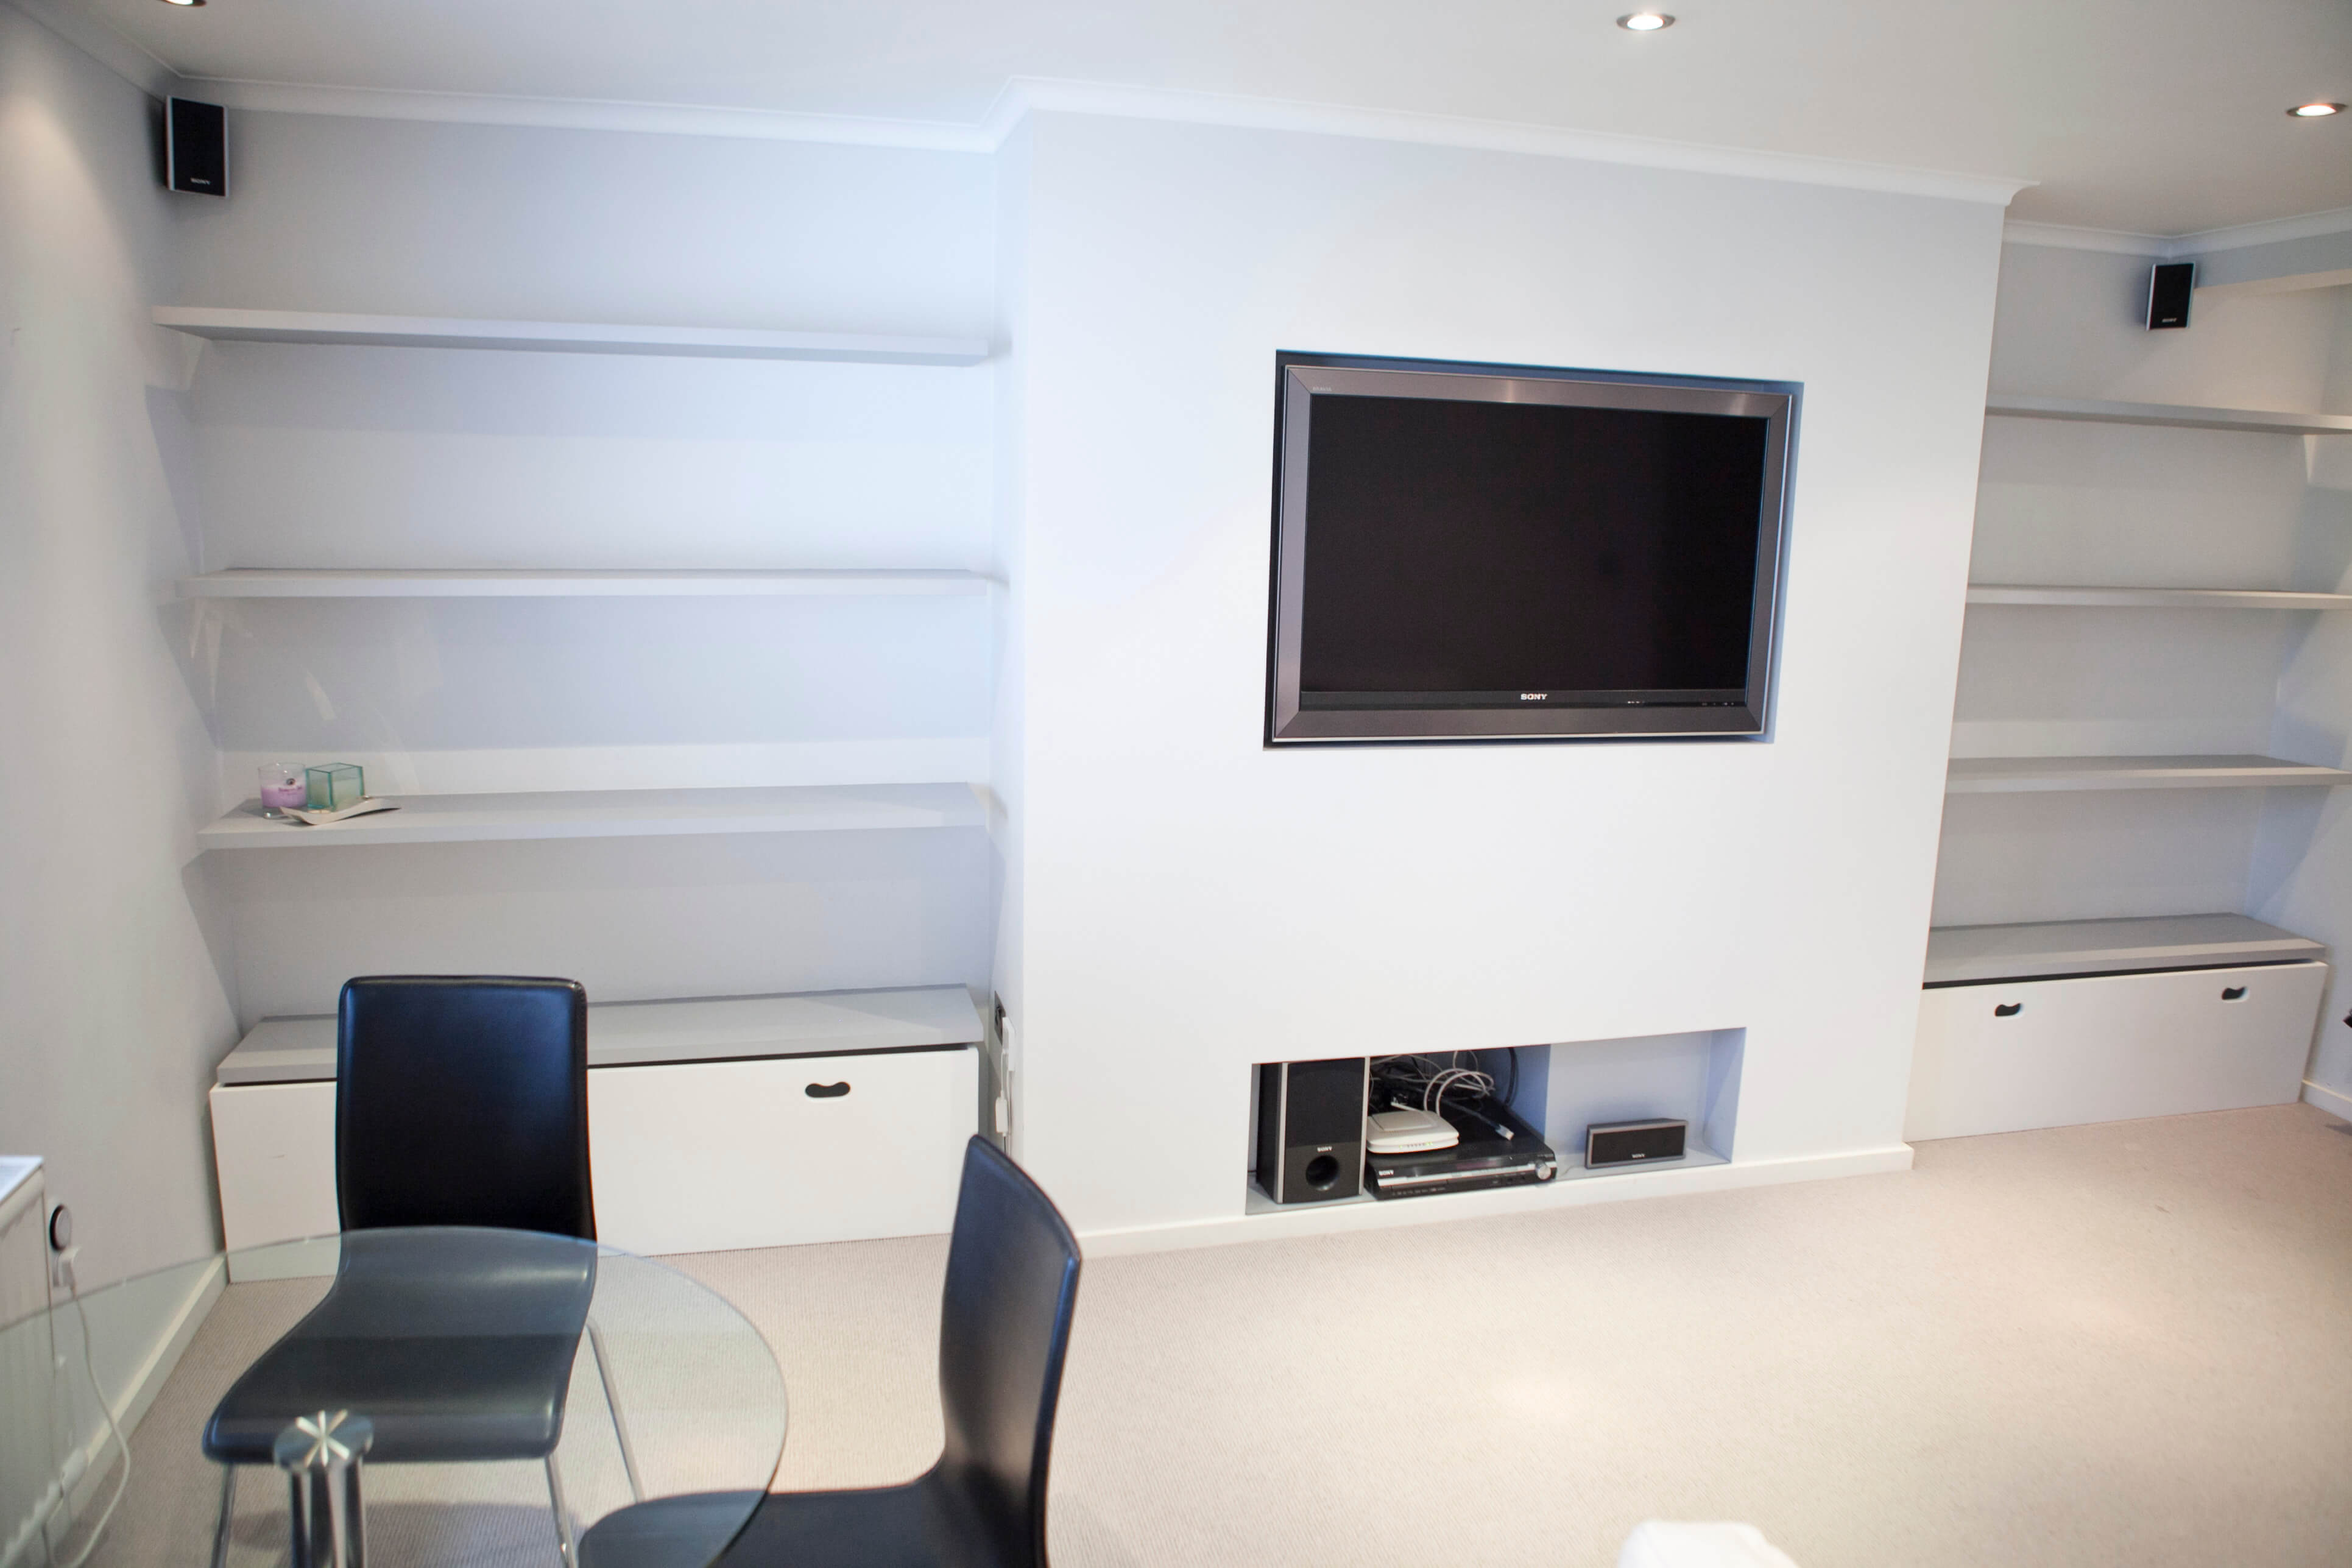 IMG 31121 - Property Listings